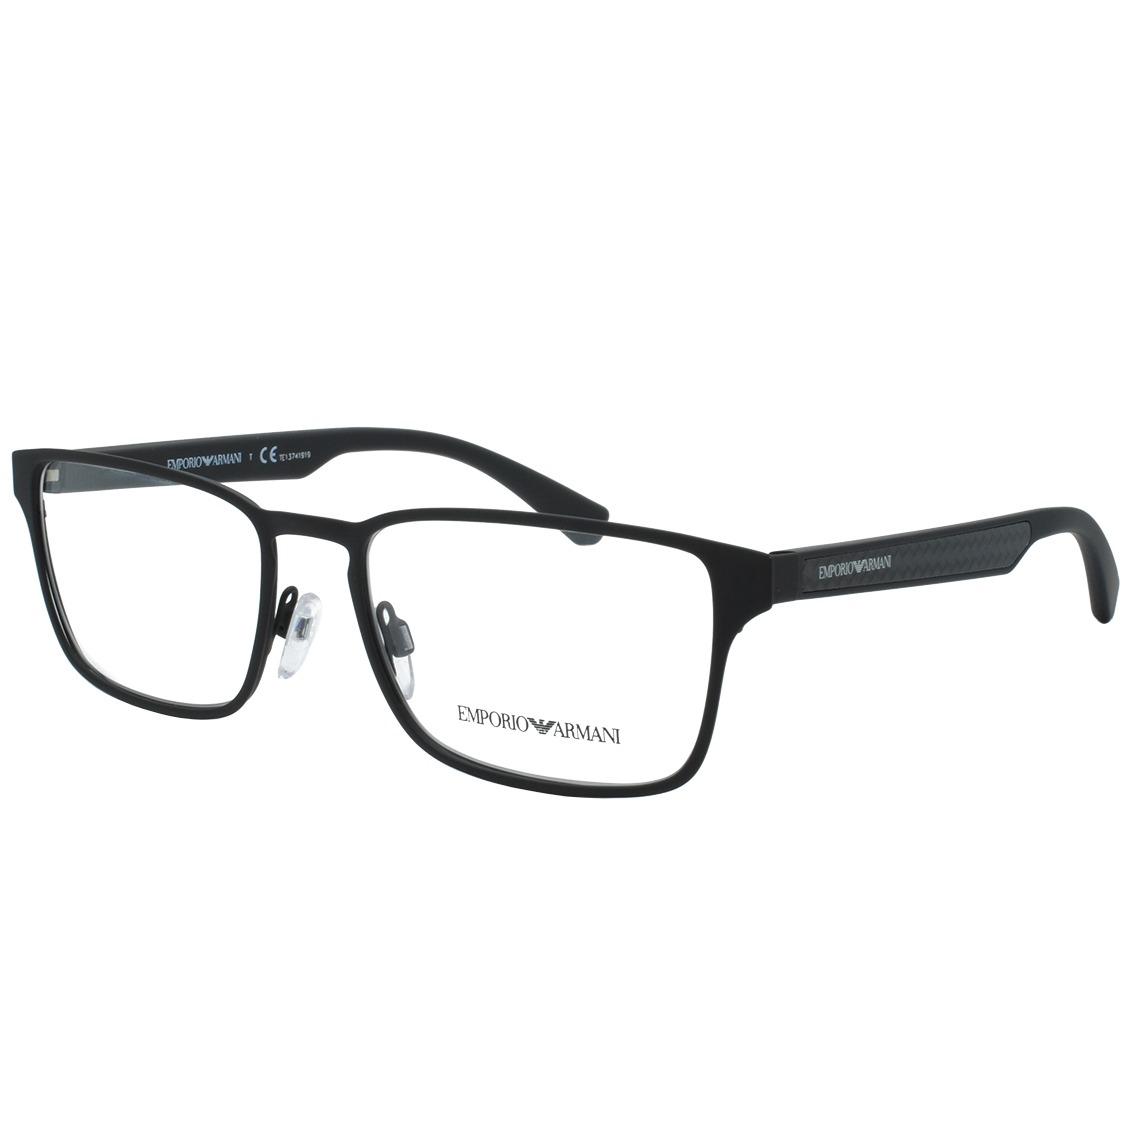 óculos de grau emporio armani masculino original ea1063 3094. Carregando  zoom. 86bf766e13